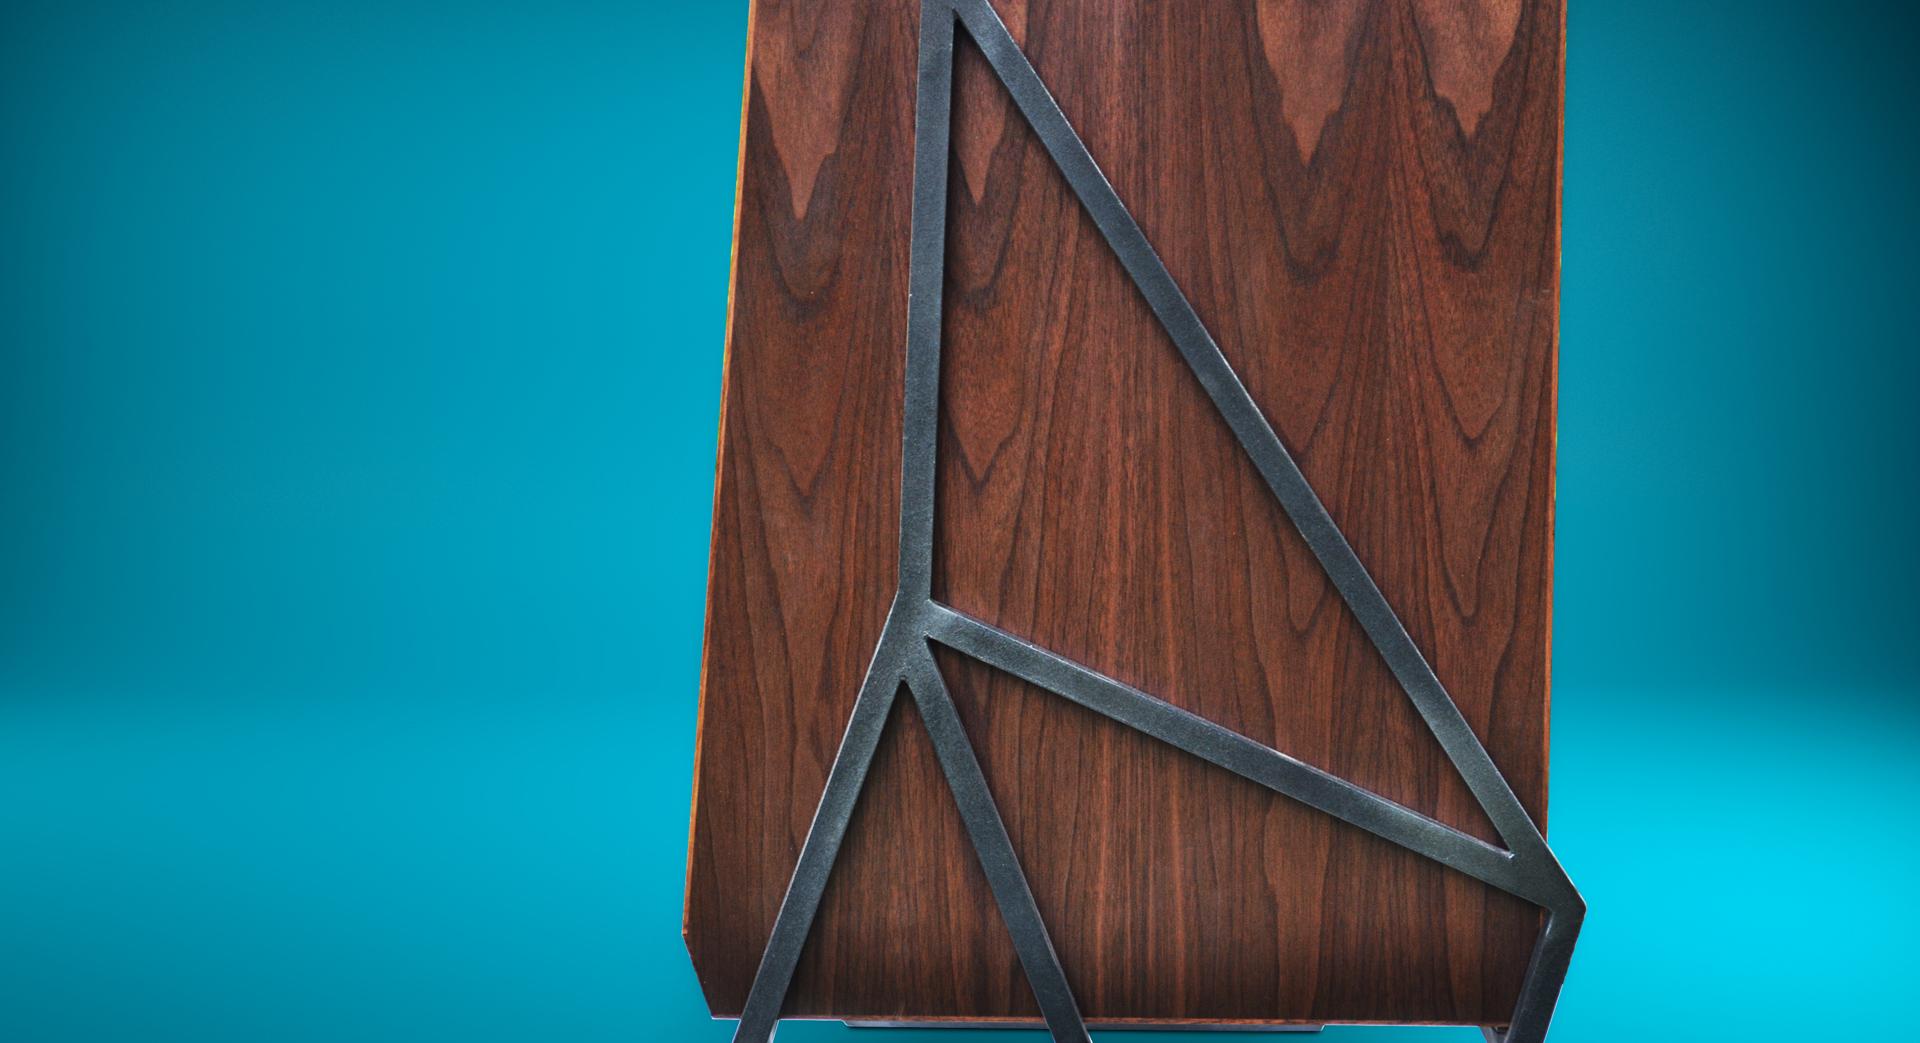 D'onis dresser 4- custom made by Arostegui Studio